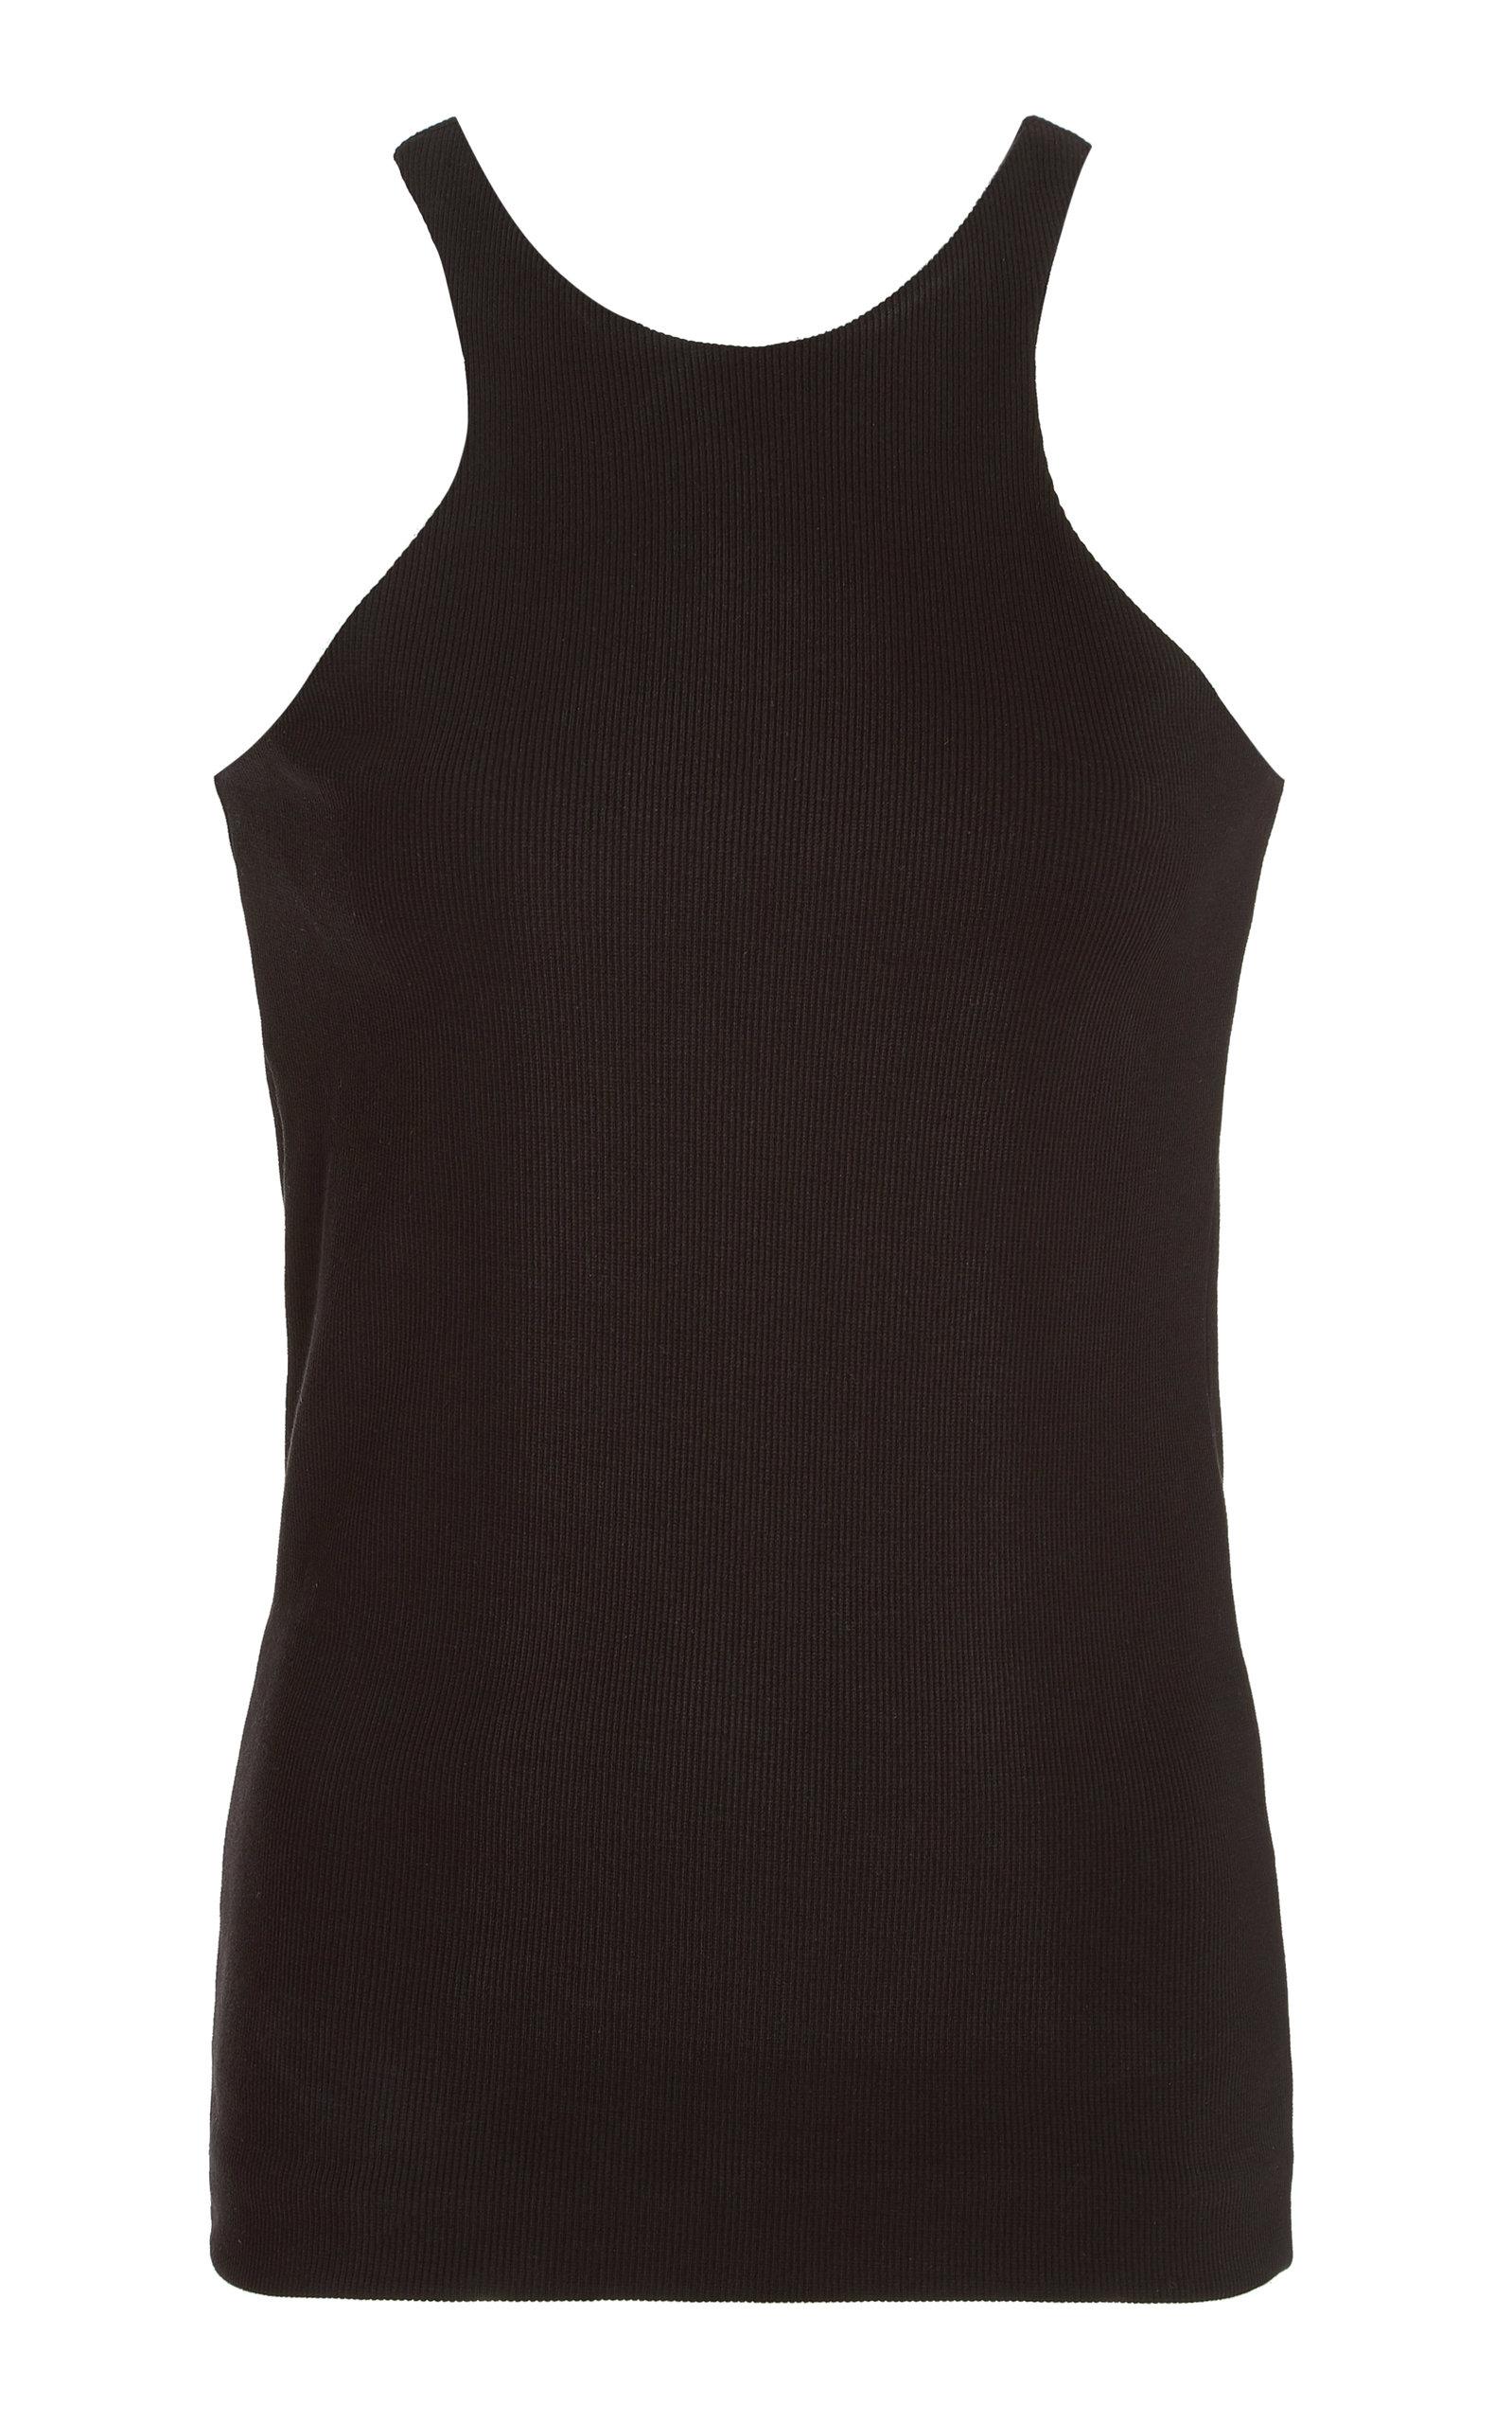 Gauge81 Cottons WOMEN'S NICE RIBBED-KNIT TANK TOP